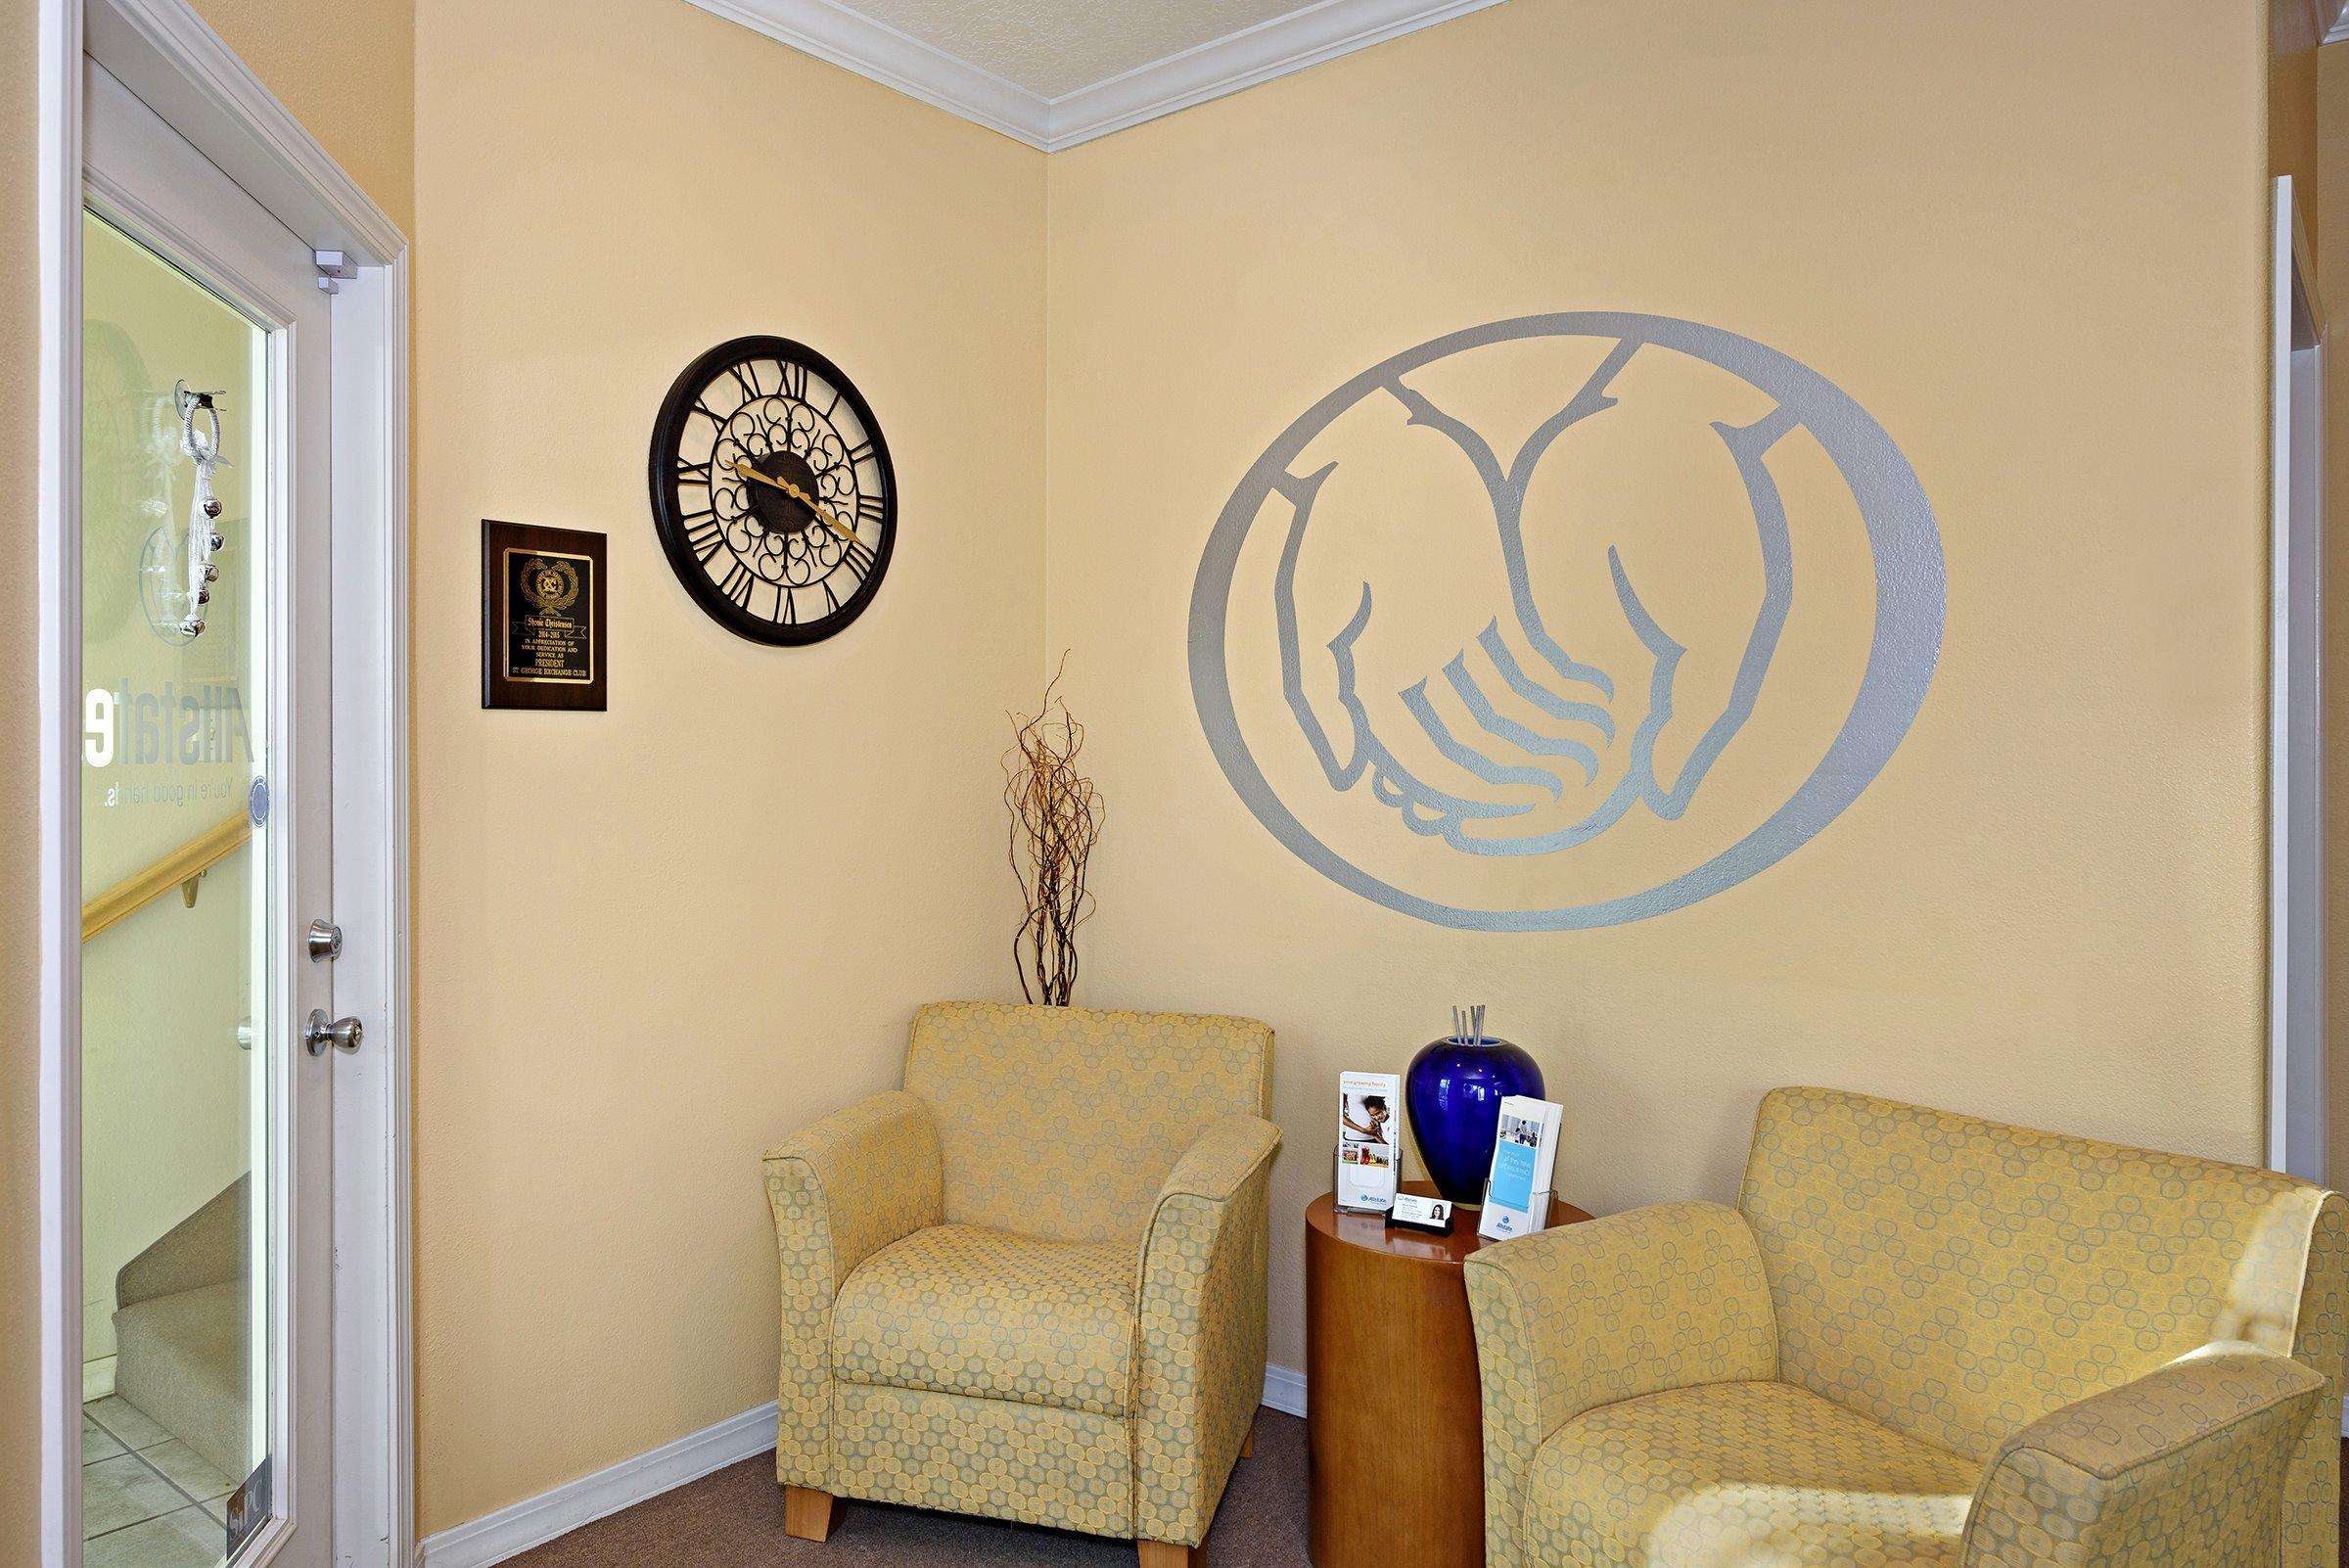 The Shonie Insurance Group, LLC: Allstate Insurance image 1